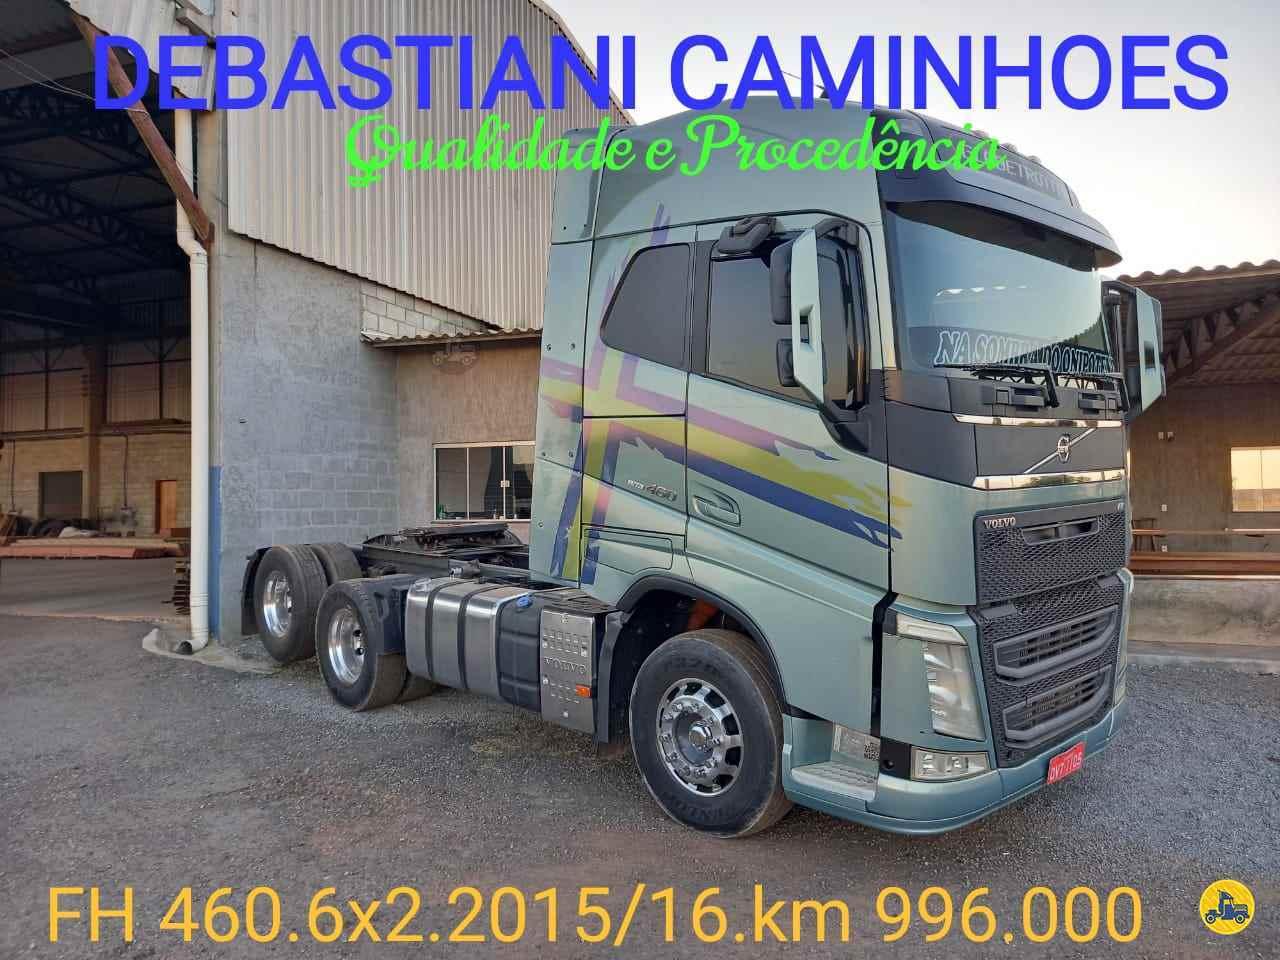 CAMINHAO VOLVO VOLVO FH 460 Cavalo Mecânico Truck 6x2 Debastiani Caminhões ANAPOLIS GOIAS GO